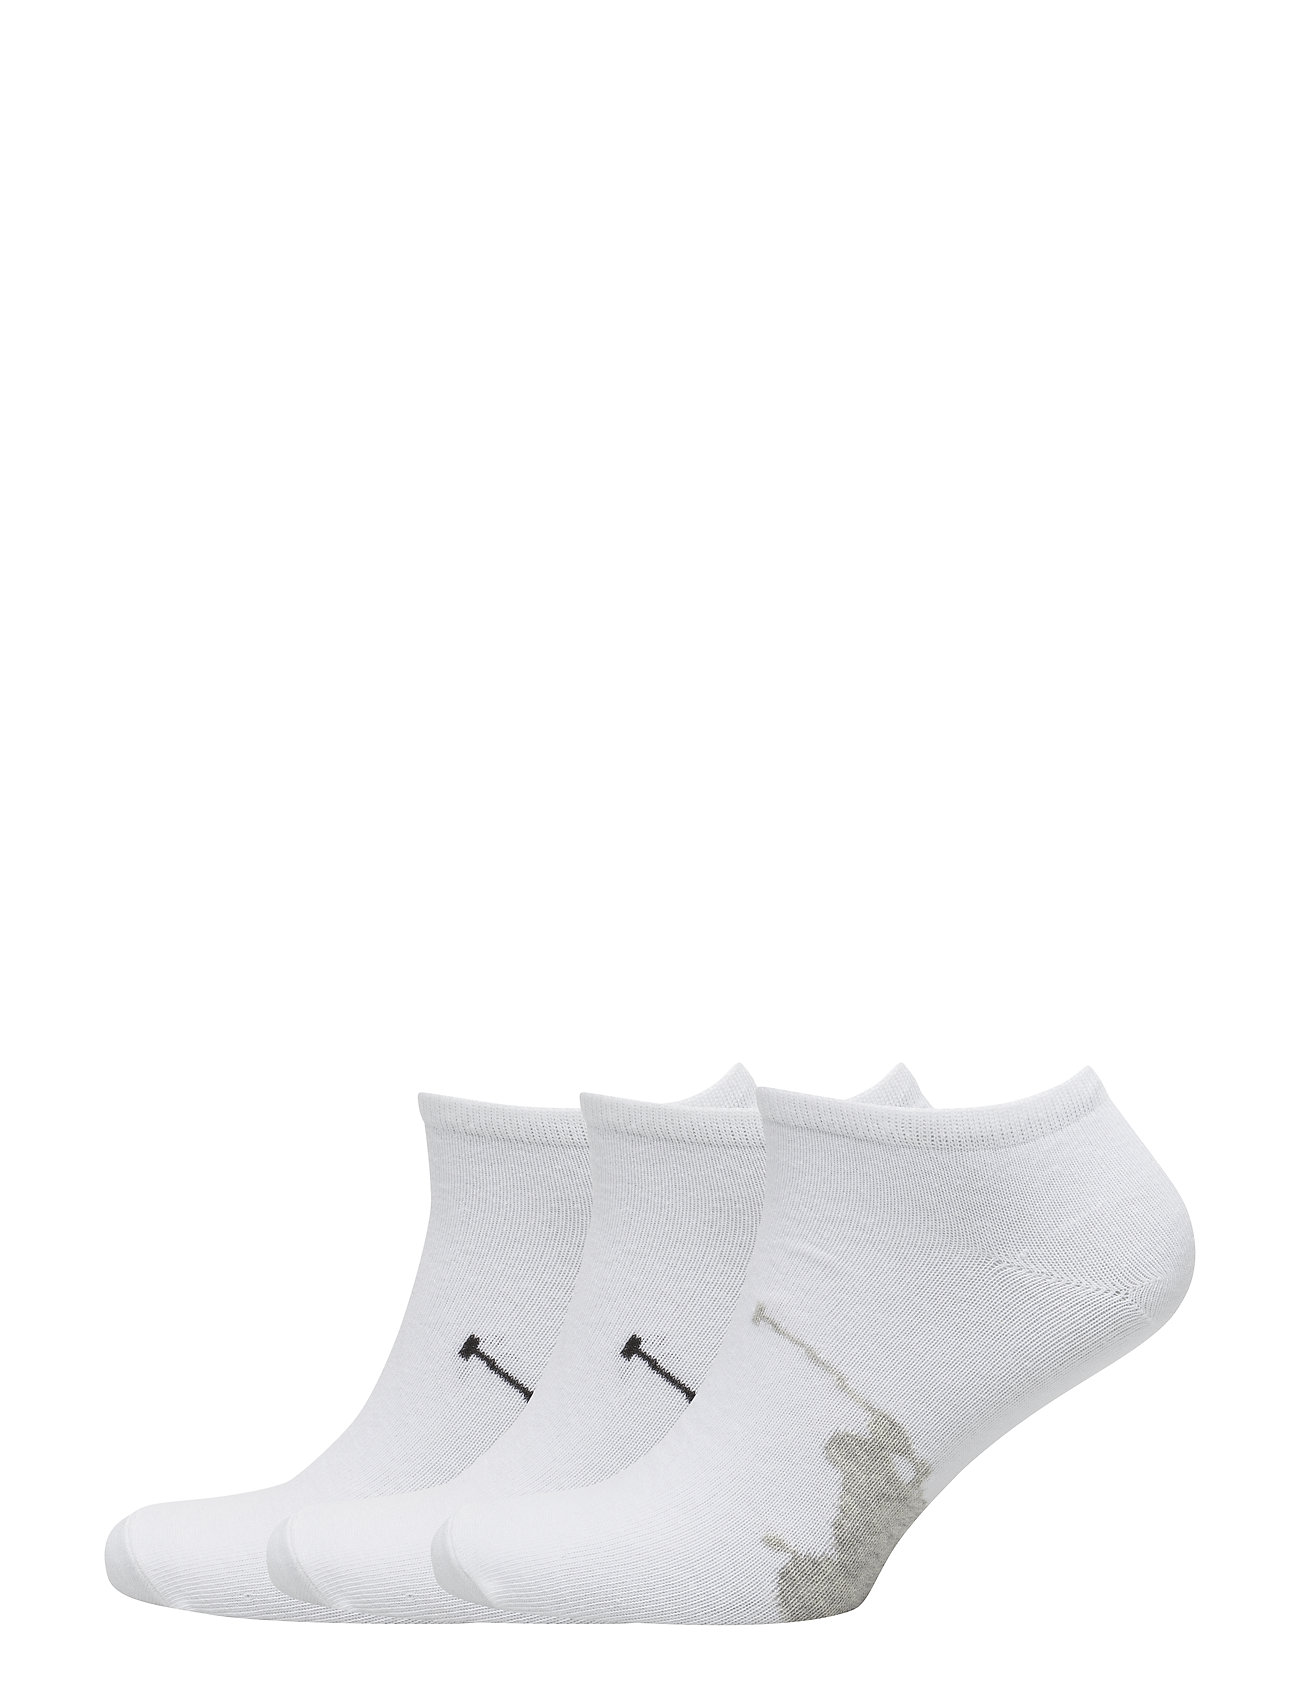 Polo Ralph Lauren Underwear Big Pony Sock 3-Pack - WHITE